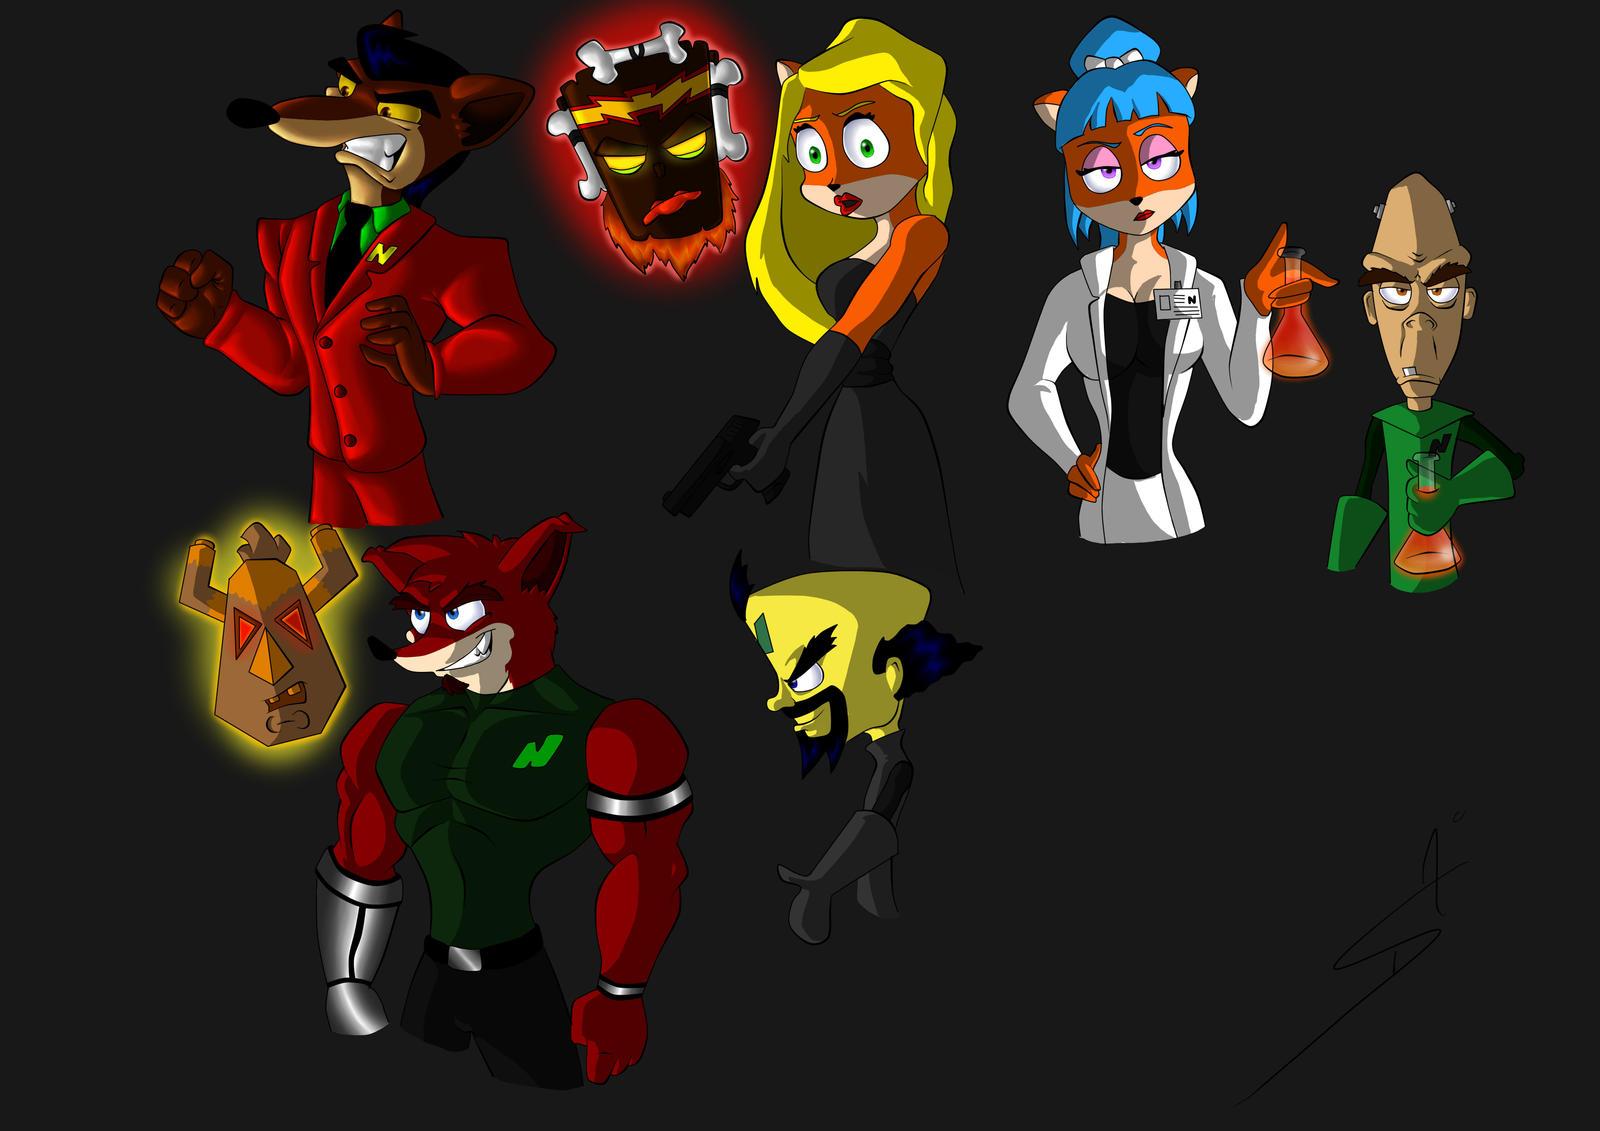 random crash bandicoot characters by DSA09 on DeviantArt